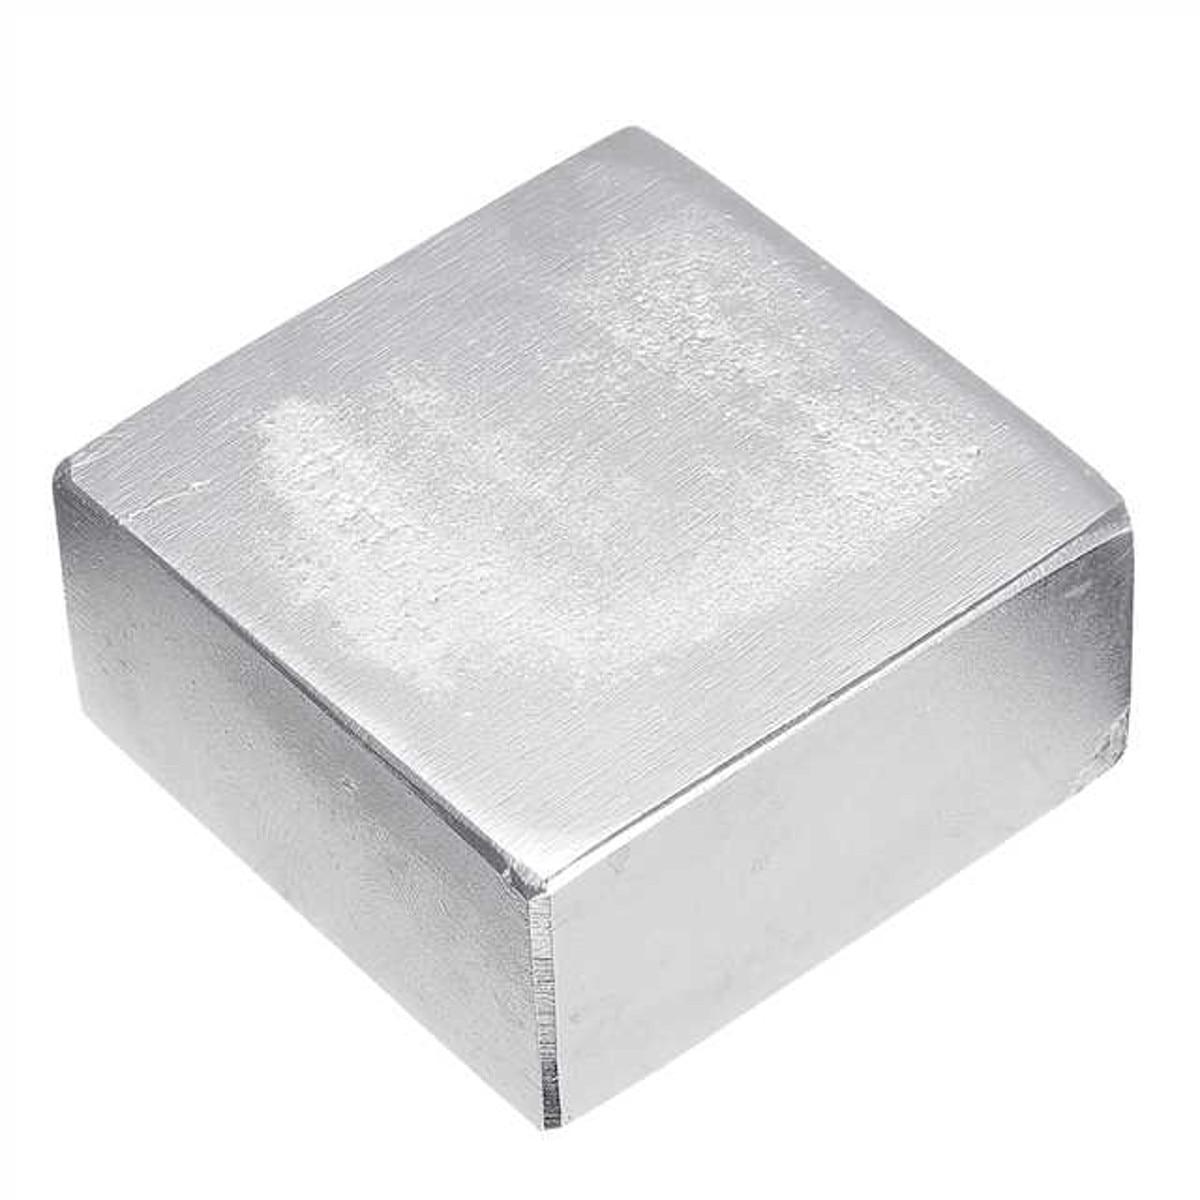 45x45x20mm N50 Magnet Block Super Strong N50 High Quality Rare Earth Magnets Neodymium Magnet45x45x20mm N50 Magnet Block Super Strong N50 High Quality Rare Earth Magnets Neodymium Magnet